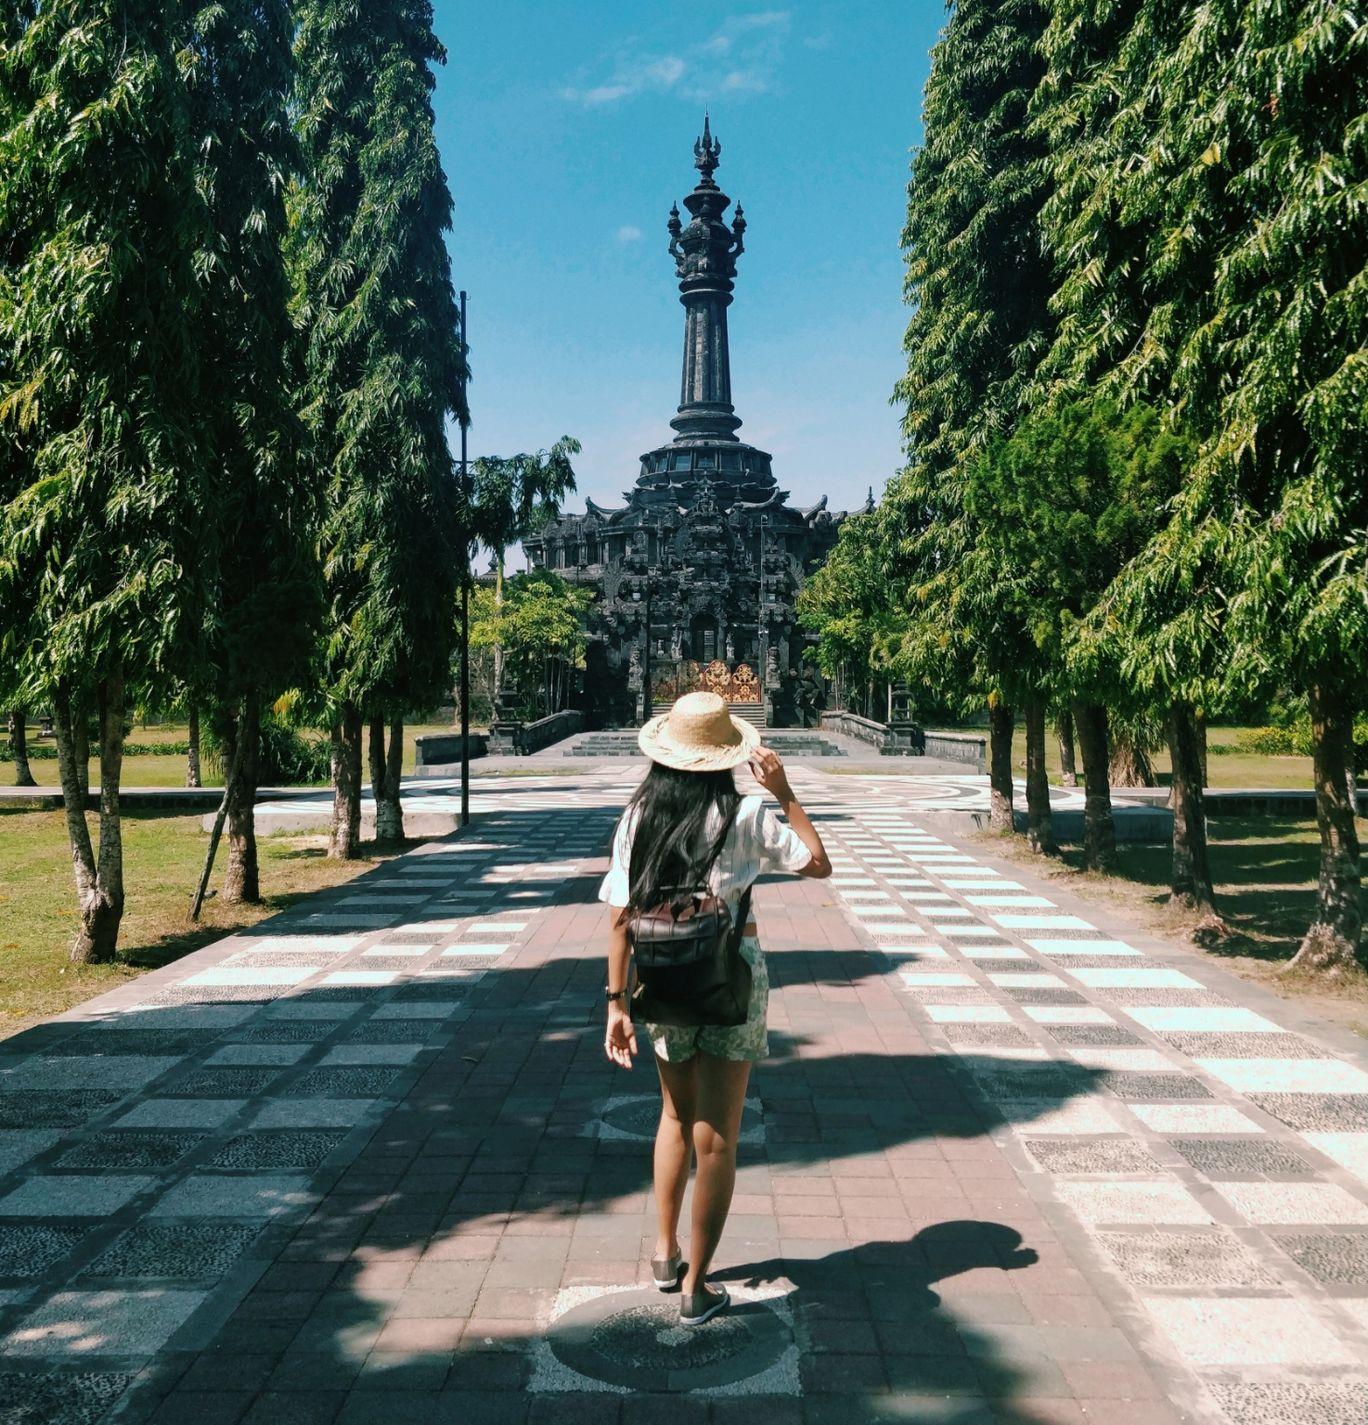 Photo of Bali By Pranali Sahasrabudhe